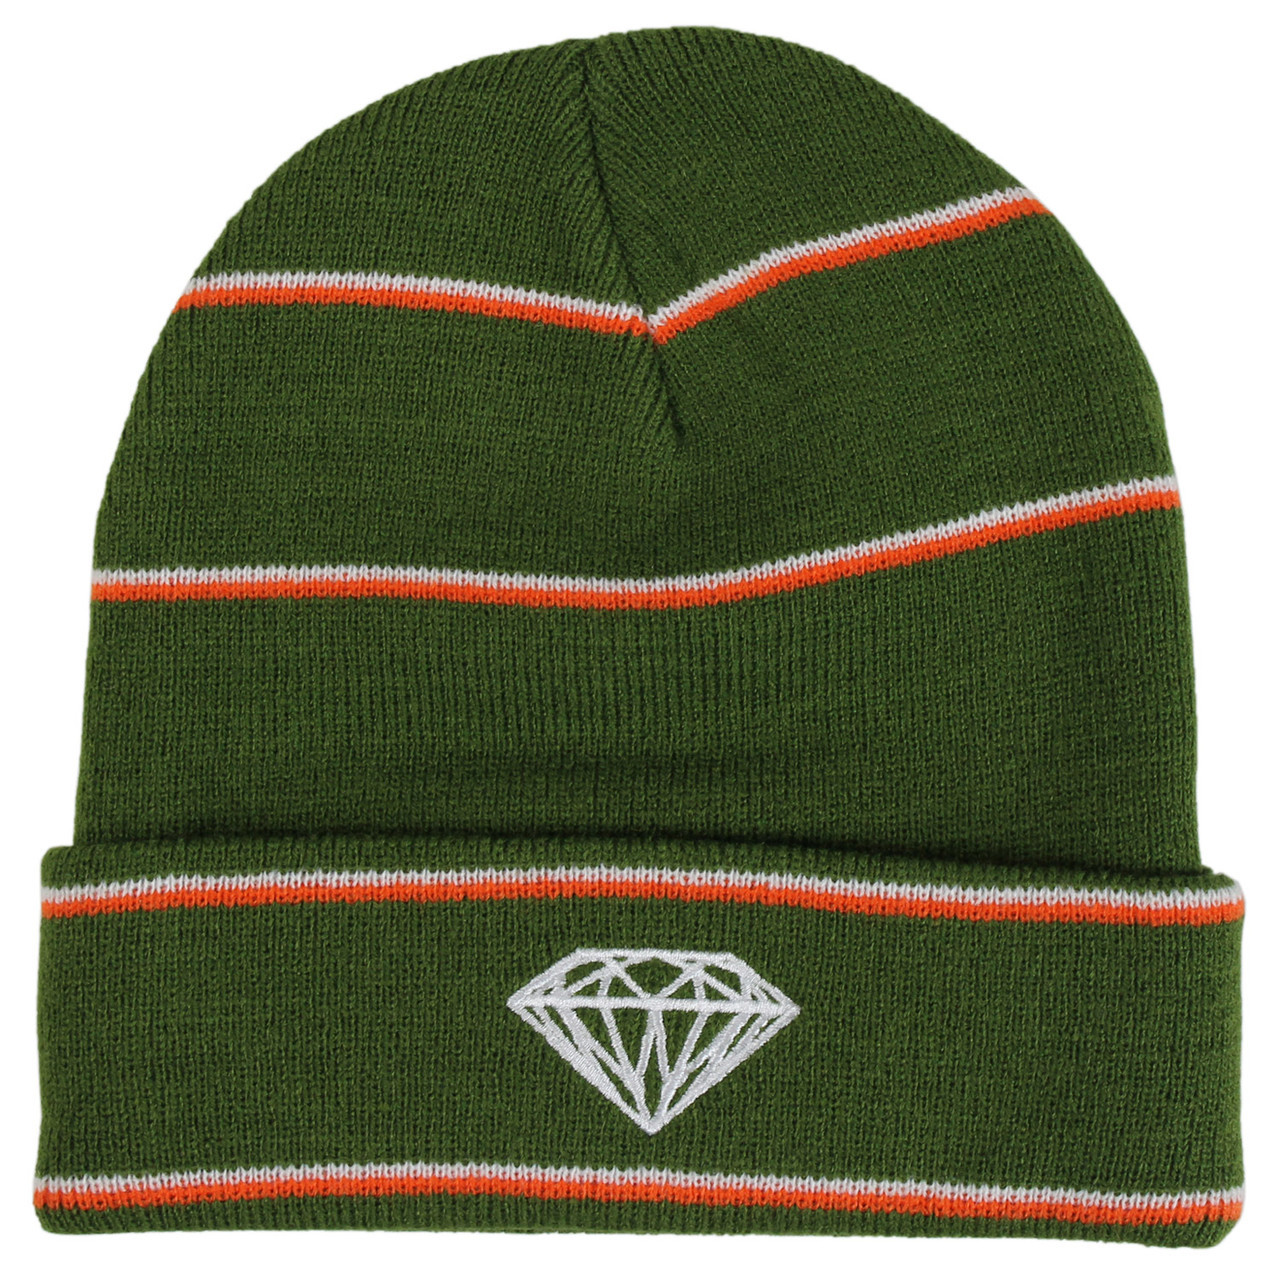 587f730d335 Diamond Supply Beanie Striped Green Orange White